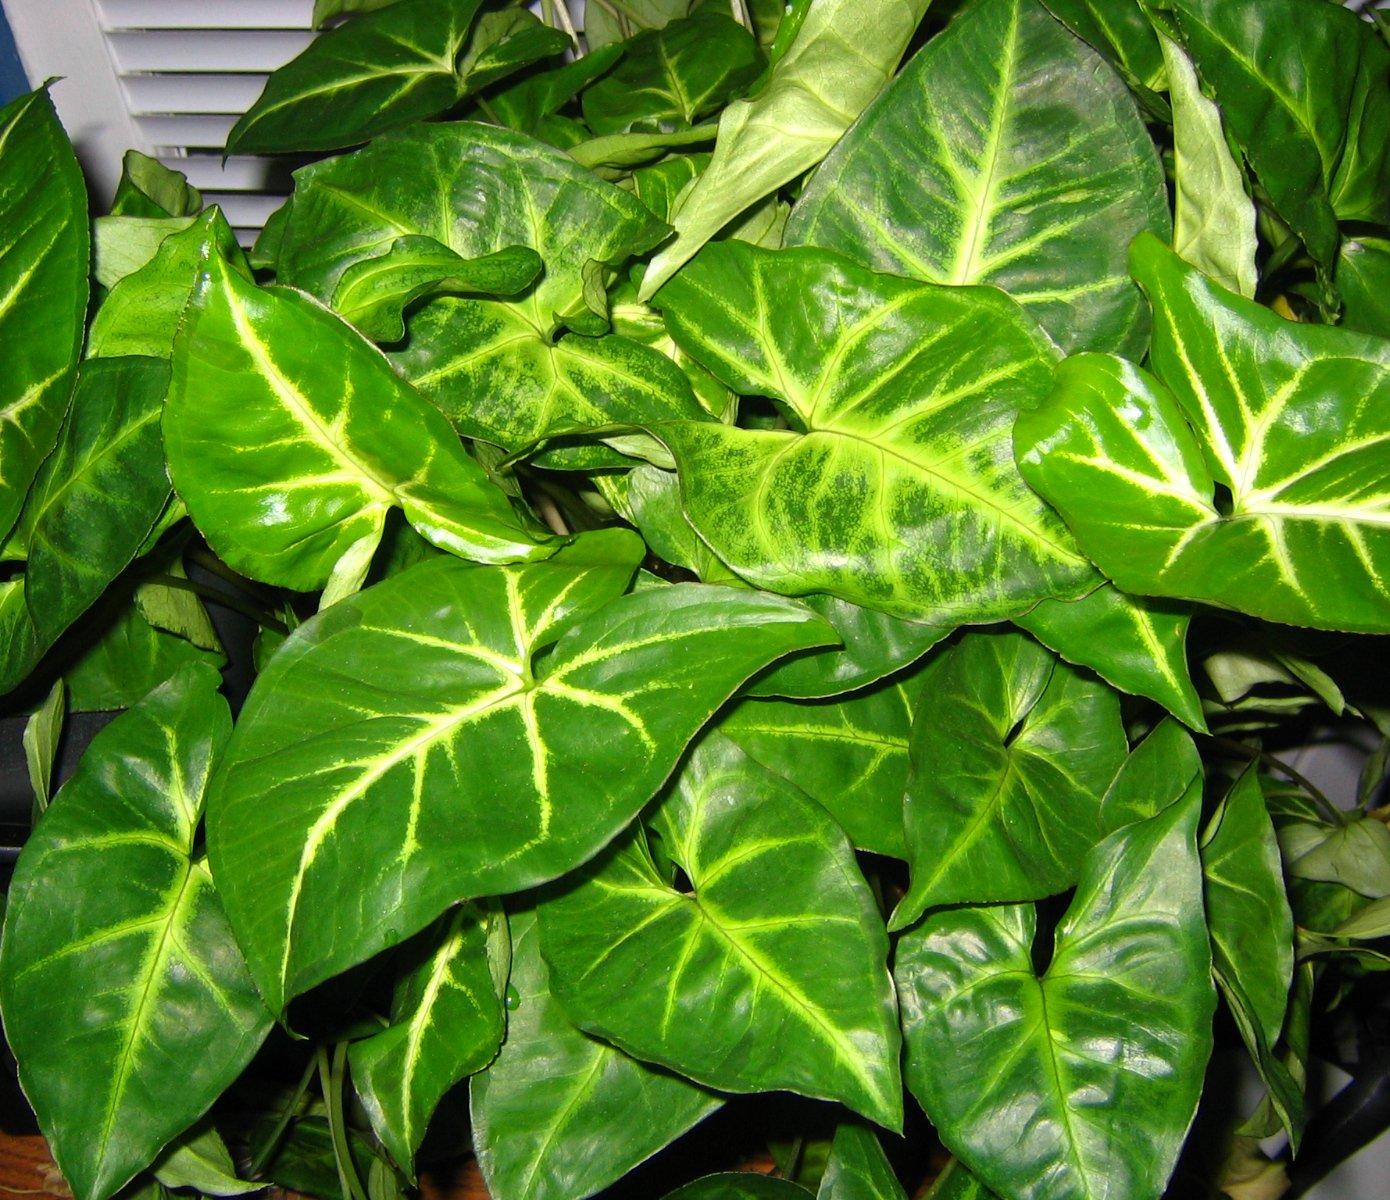 Best Kitchen Gallery: File Arrowhead Plant 002 Wikimedia Mons of Arrowhead House Plant Names on rachelxblog.com